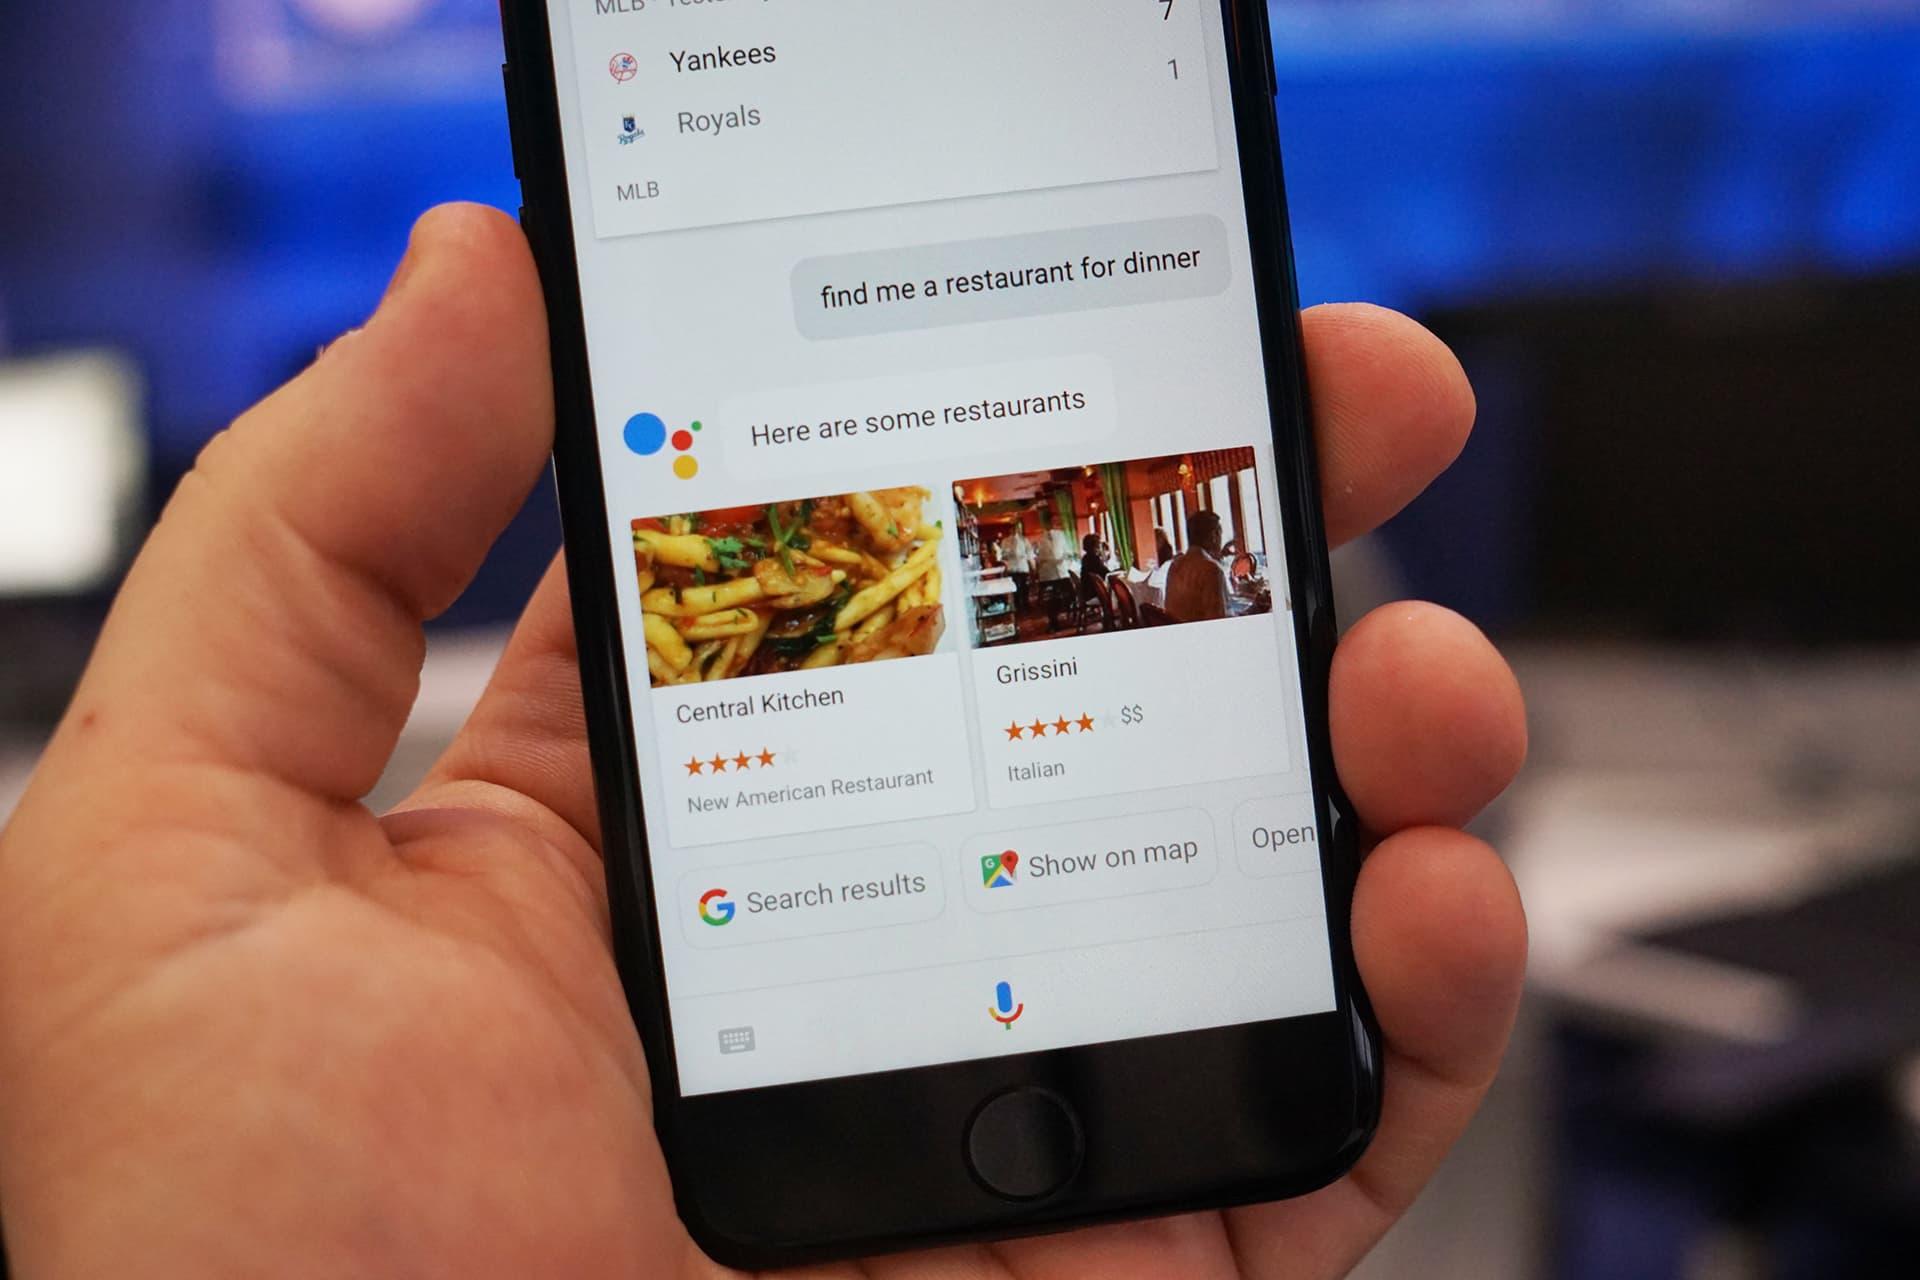 Siri Vs Google Assistant On Iphone